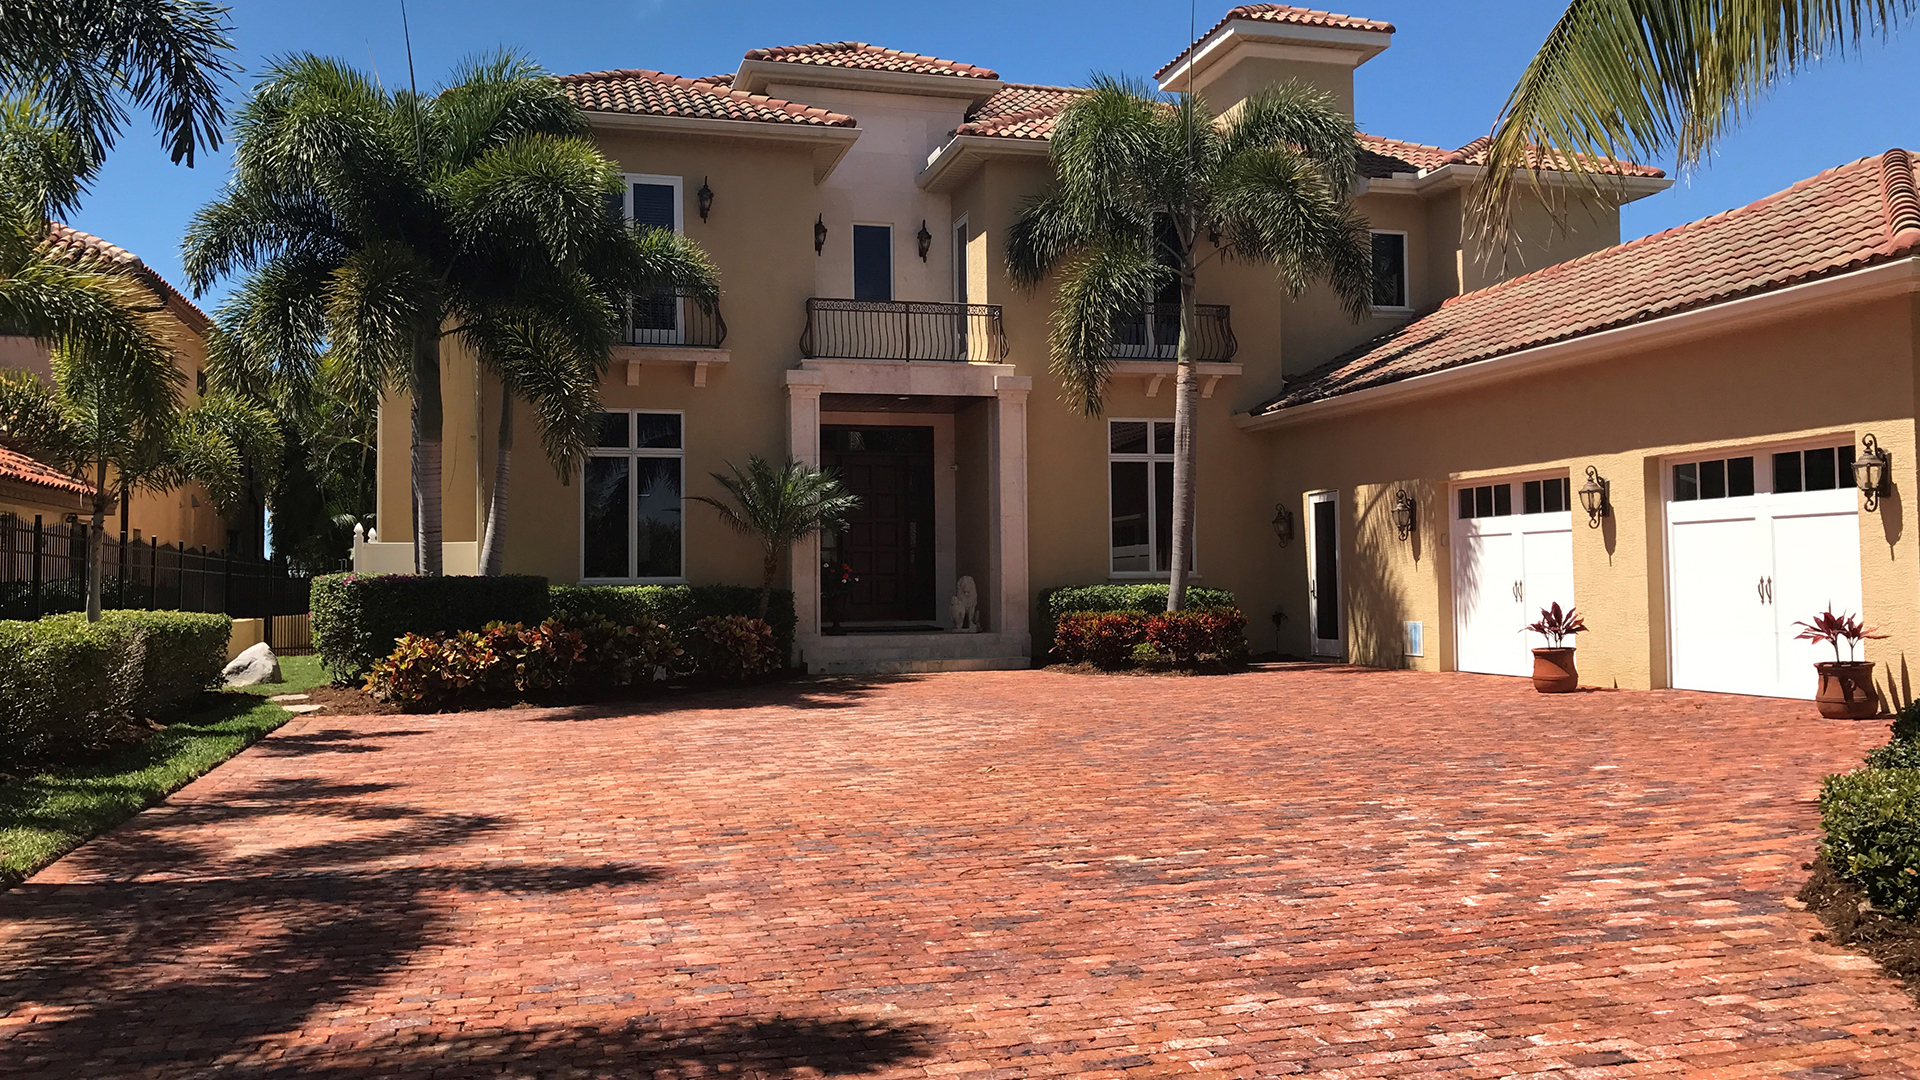 Florida Lawncare & Maintenance Inc. Landscaping Company, Landscaper and Landscaping Services slide 1